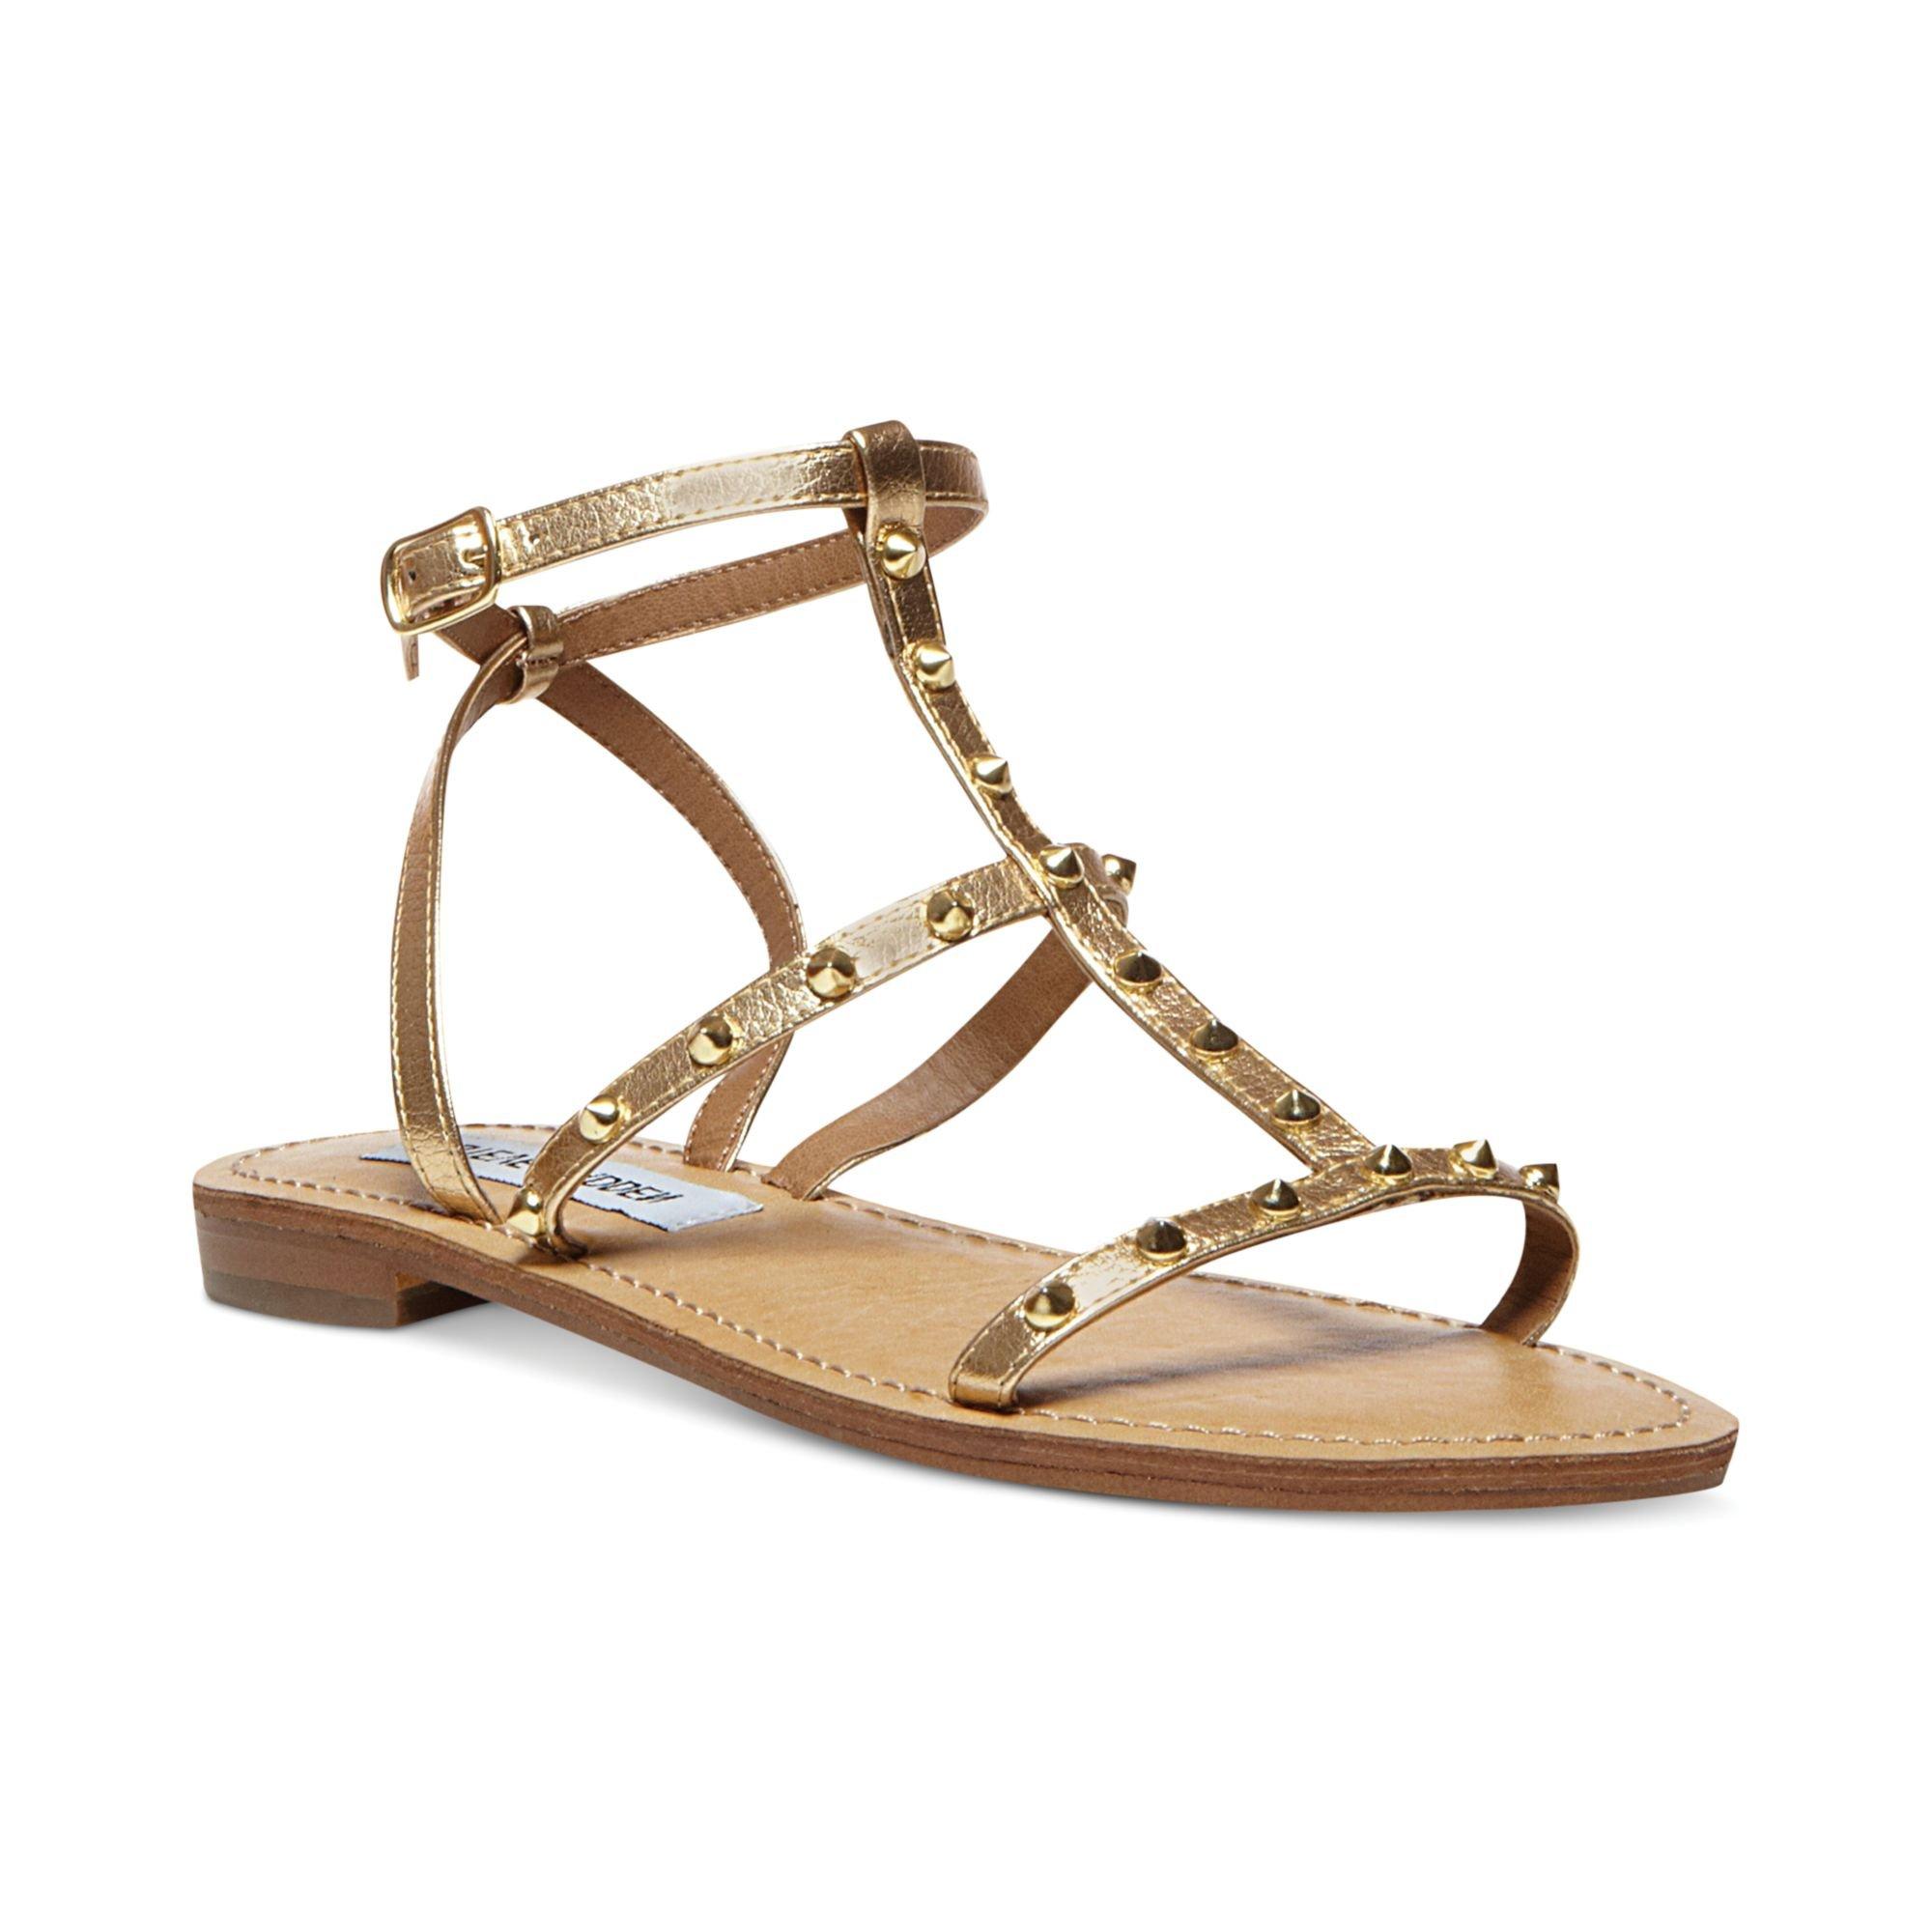 steve madden womens greenie flat sandals in gold lyst. Black Bedroom Furniture Sets. Home Design Ideas